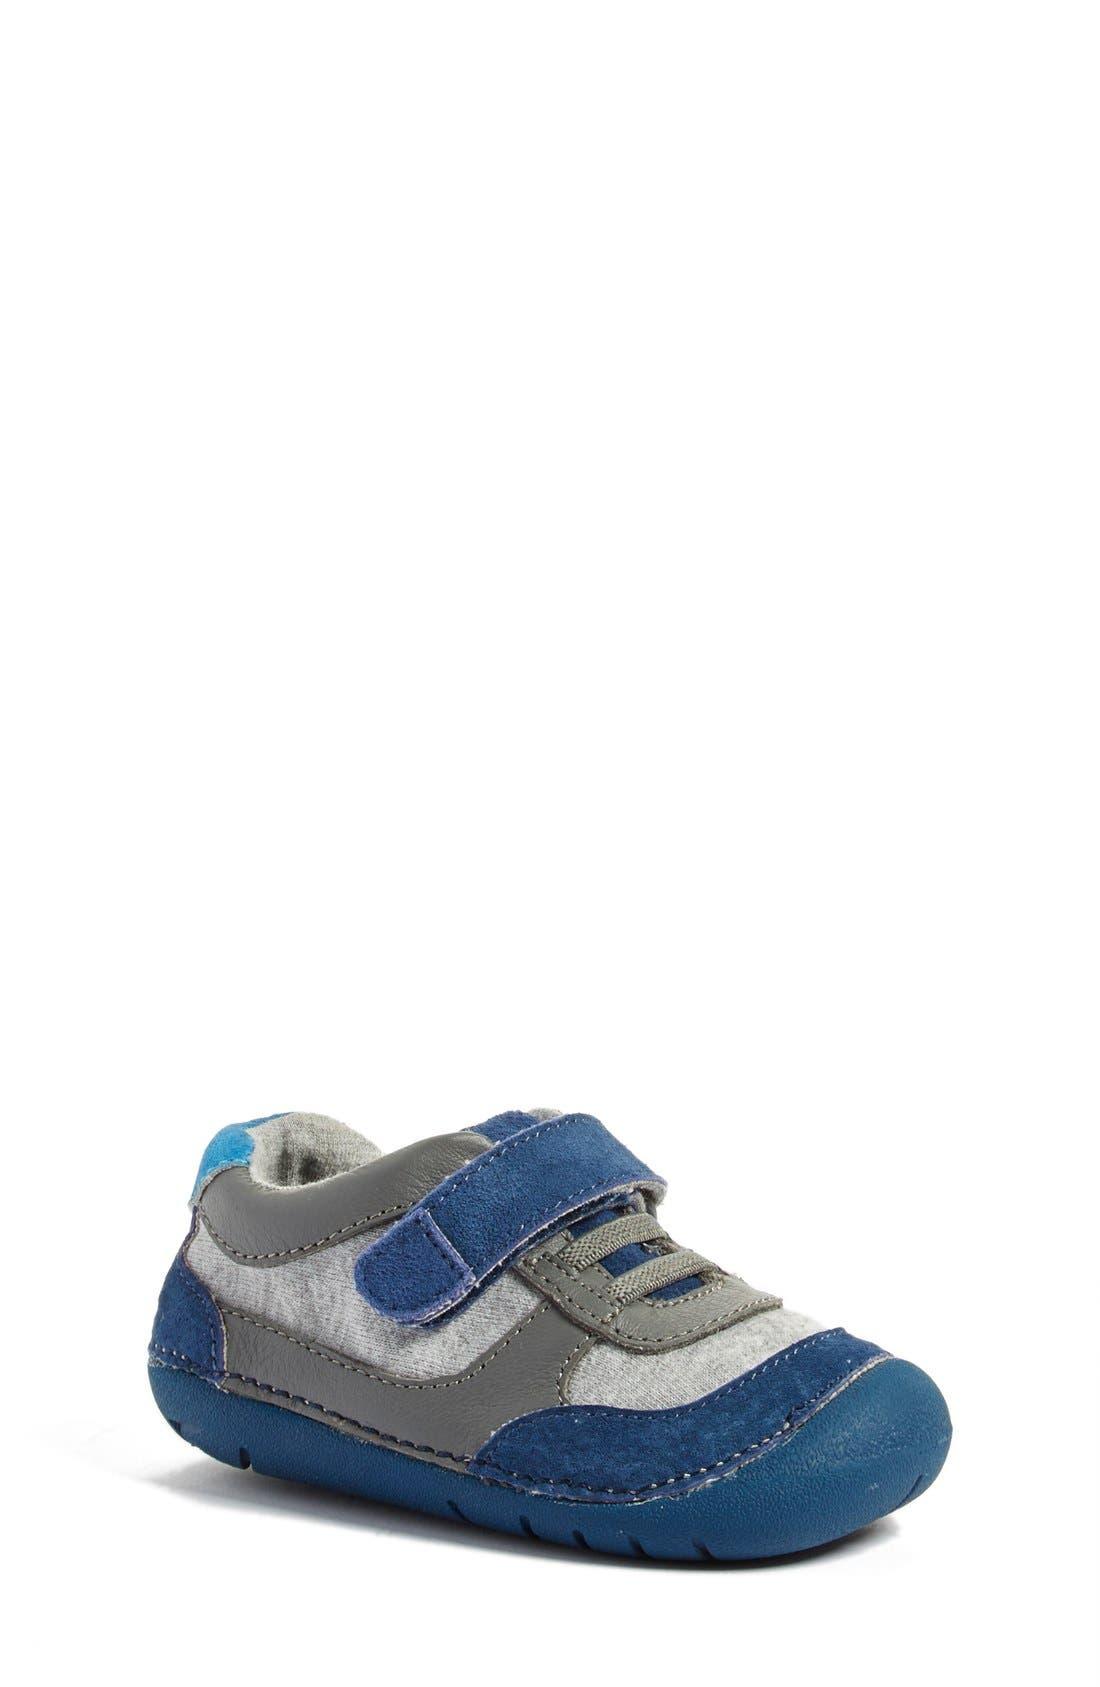 Main Image - Tucker + Tate 'Quinn' Sneaker (Baby & Walker)